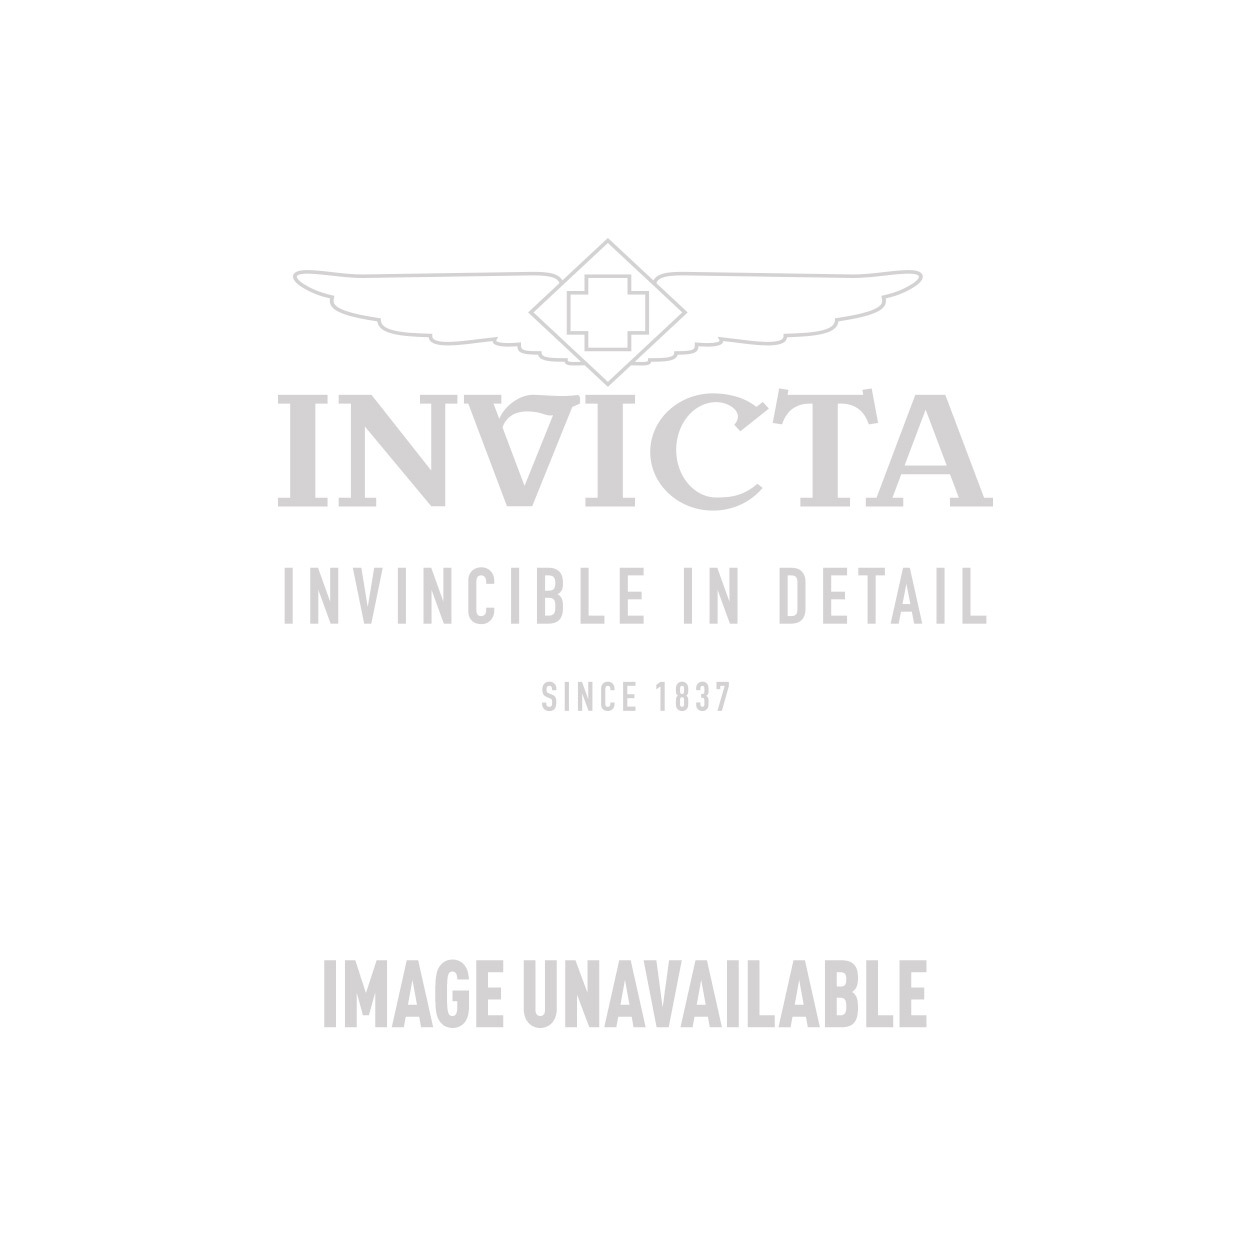 Invicta Sea Base Swiss Made Quartz Watch - Black case with Black tone Titanium band - Model 14251